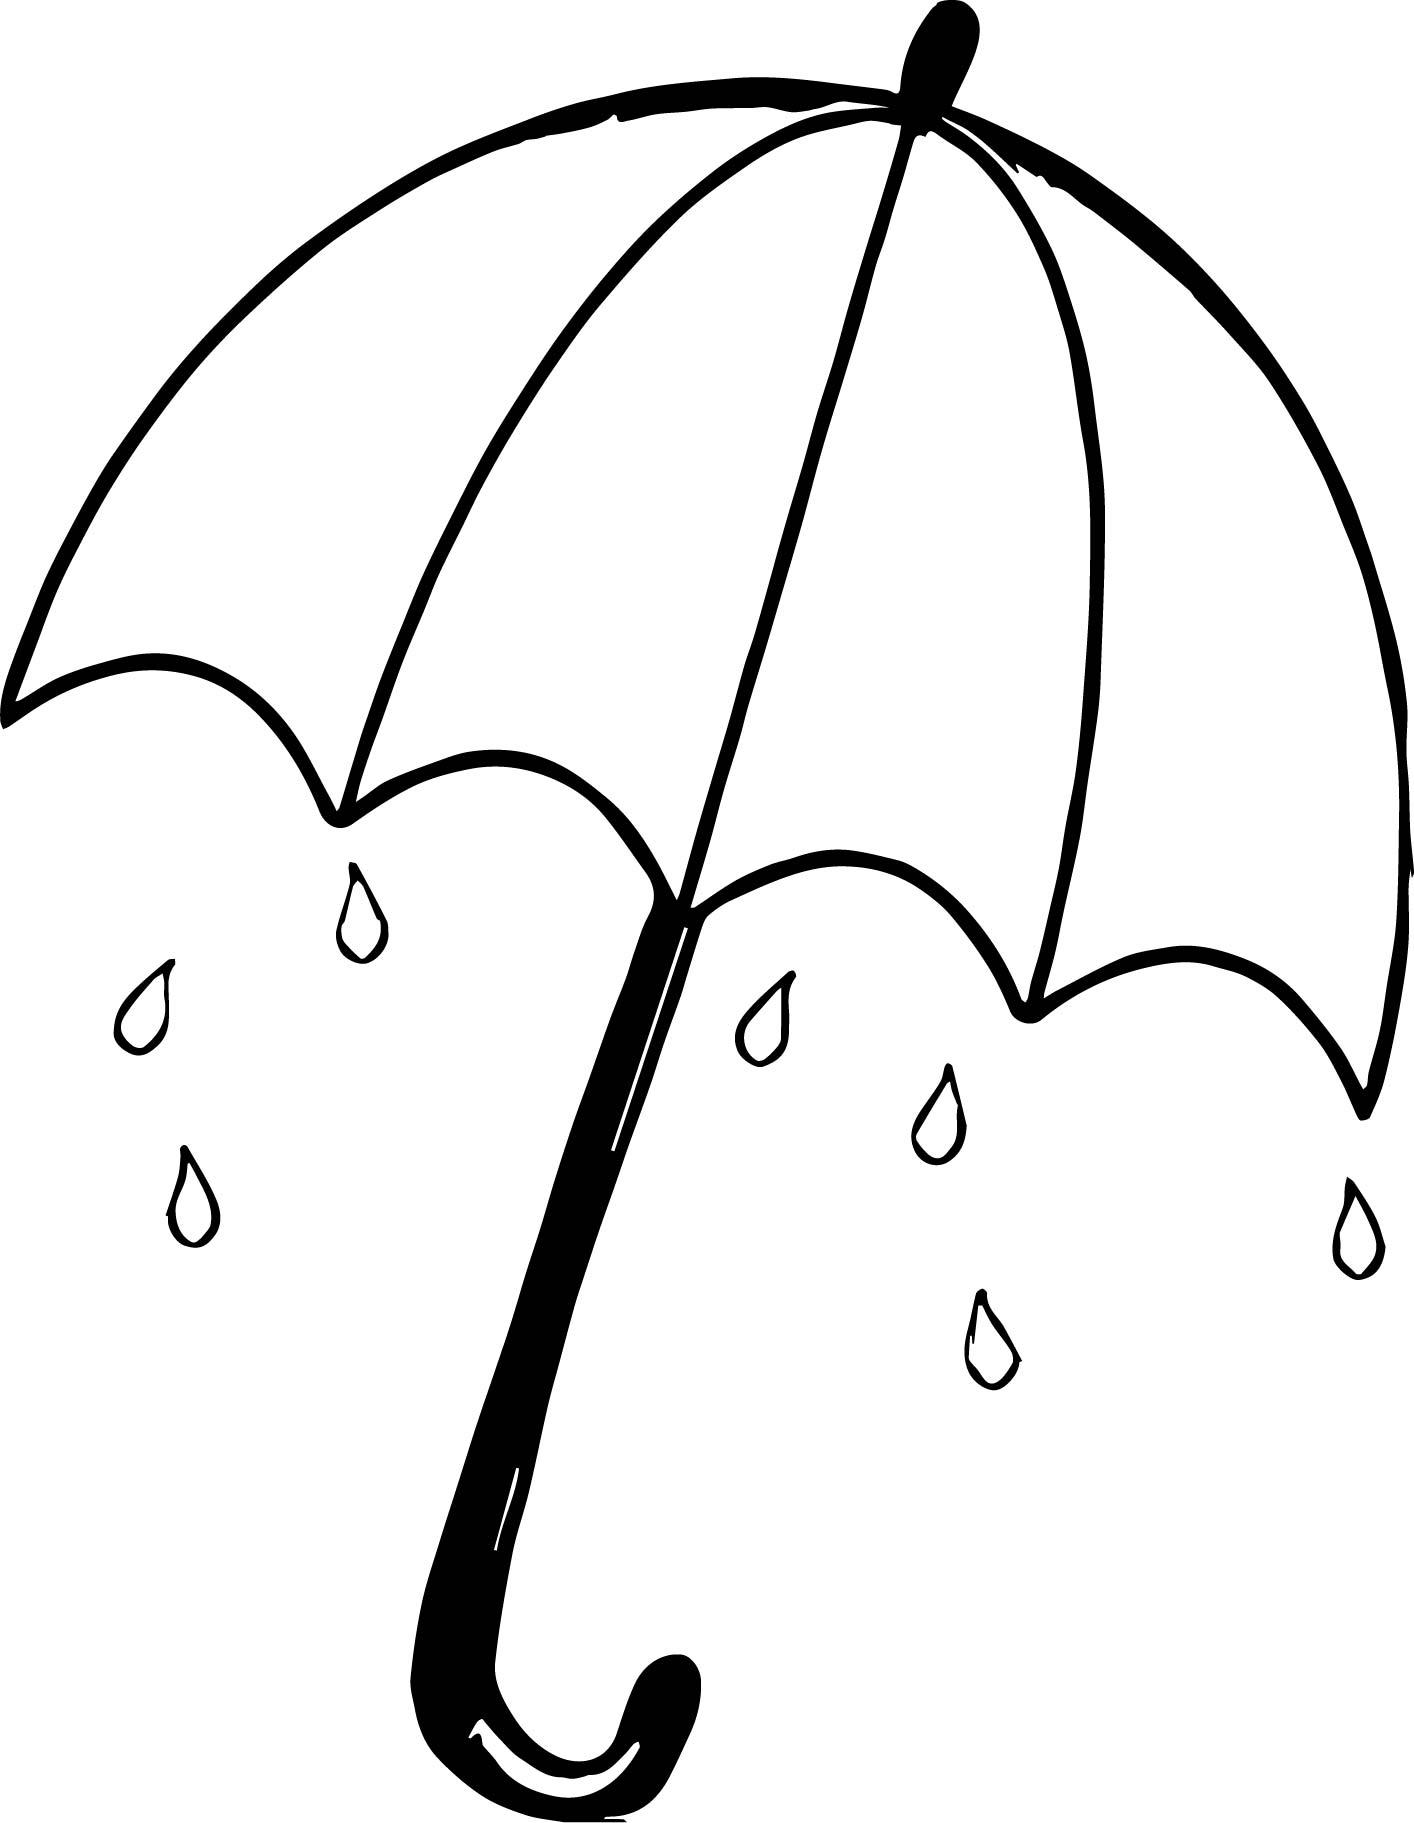 April Shower Umbrella Coloring Page